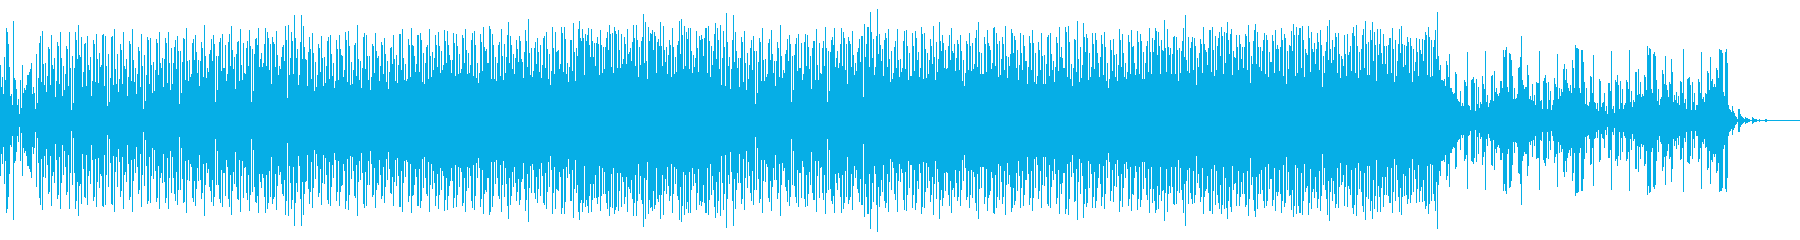 BGMにも最適なオシャレEDMの再生済みの波形